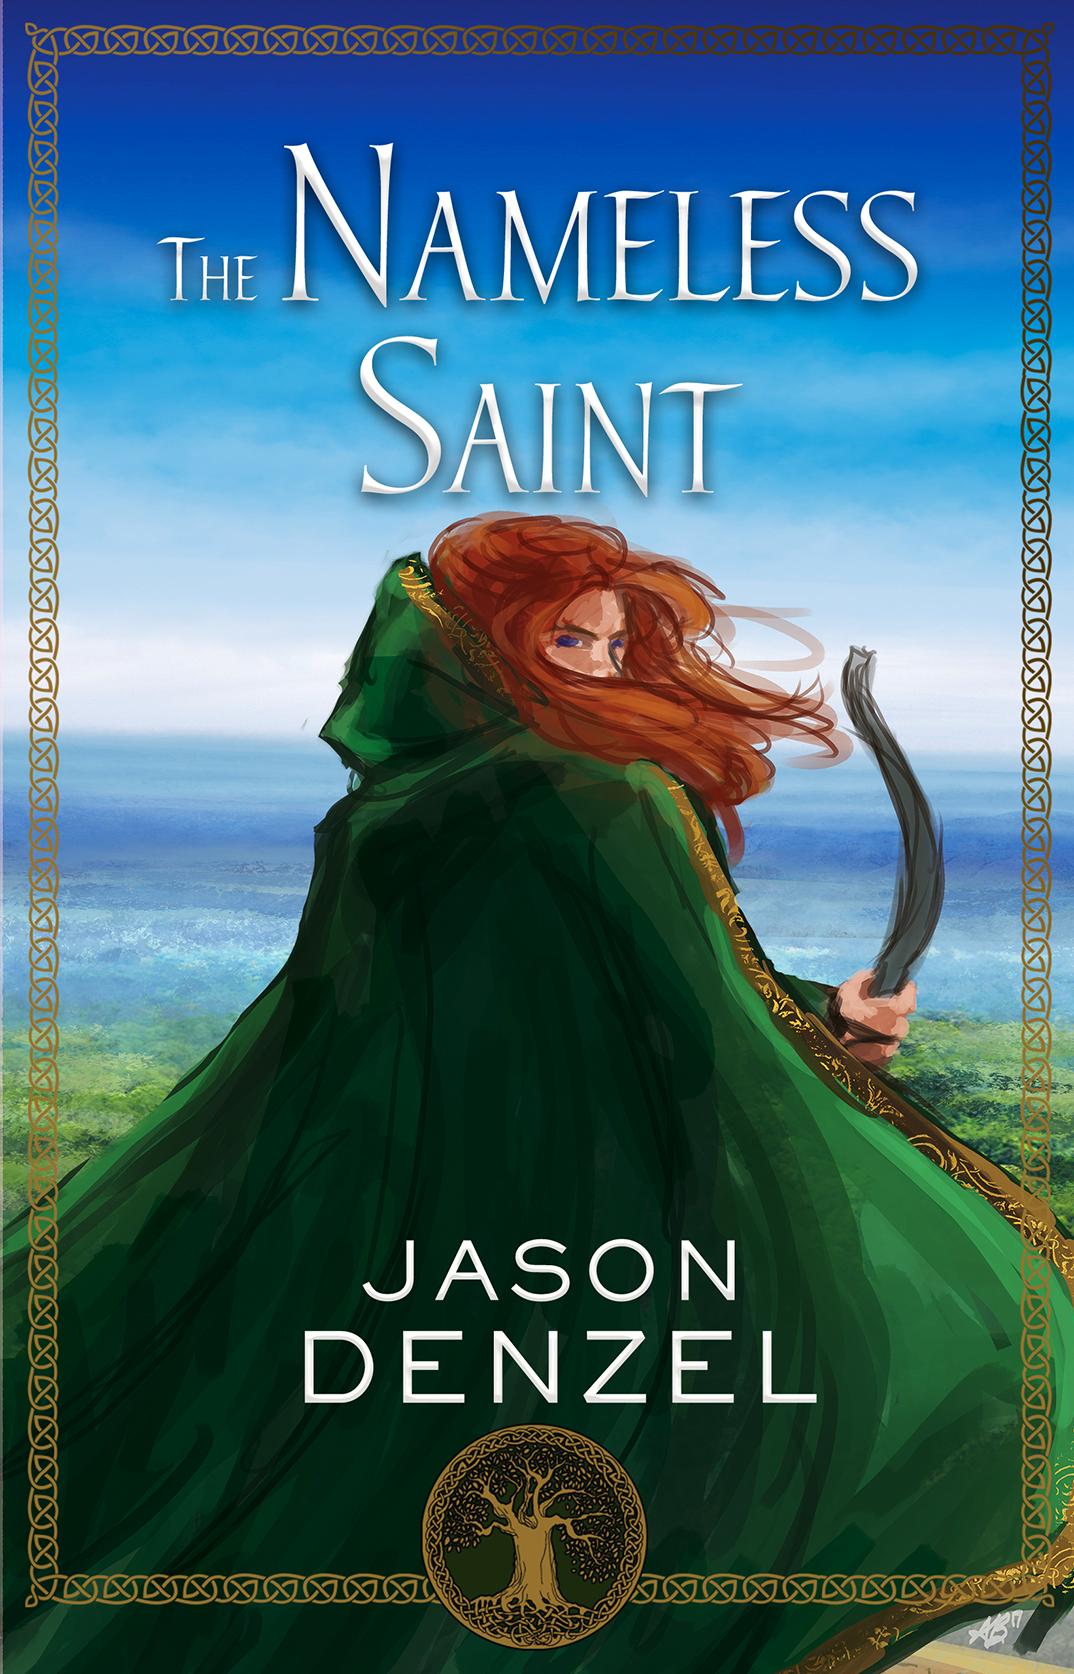 The Nameless Saint by Jason Denzel